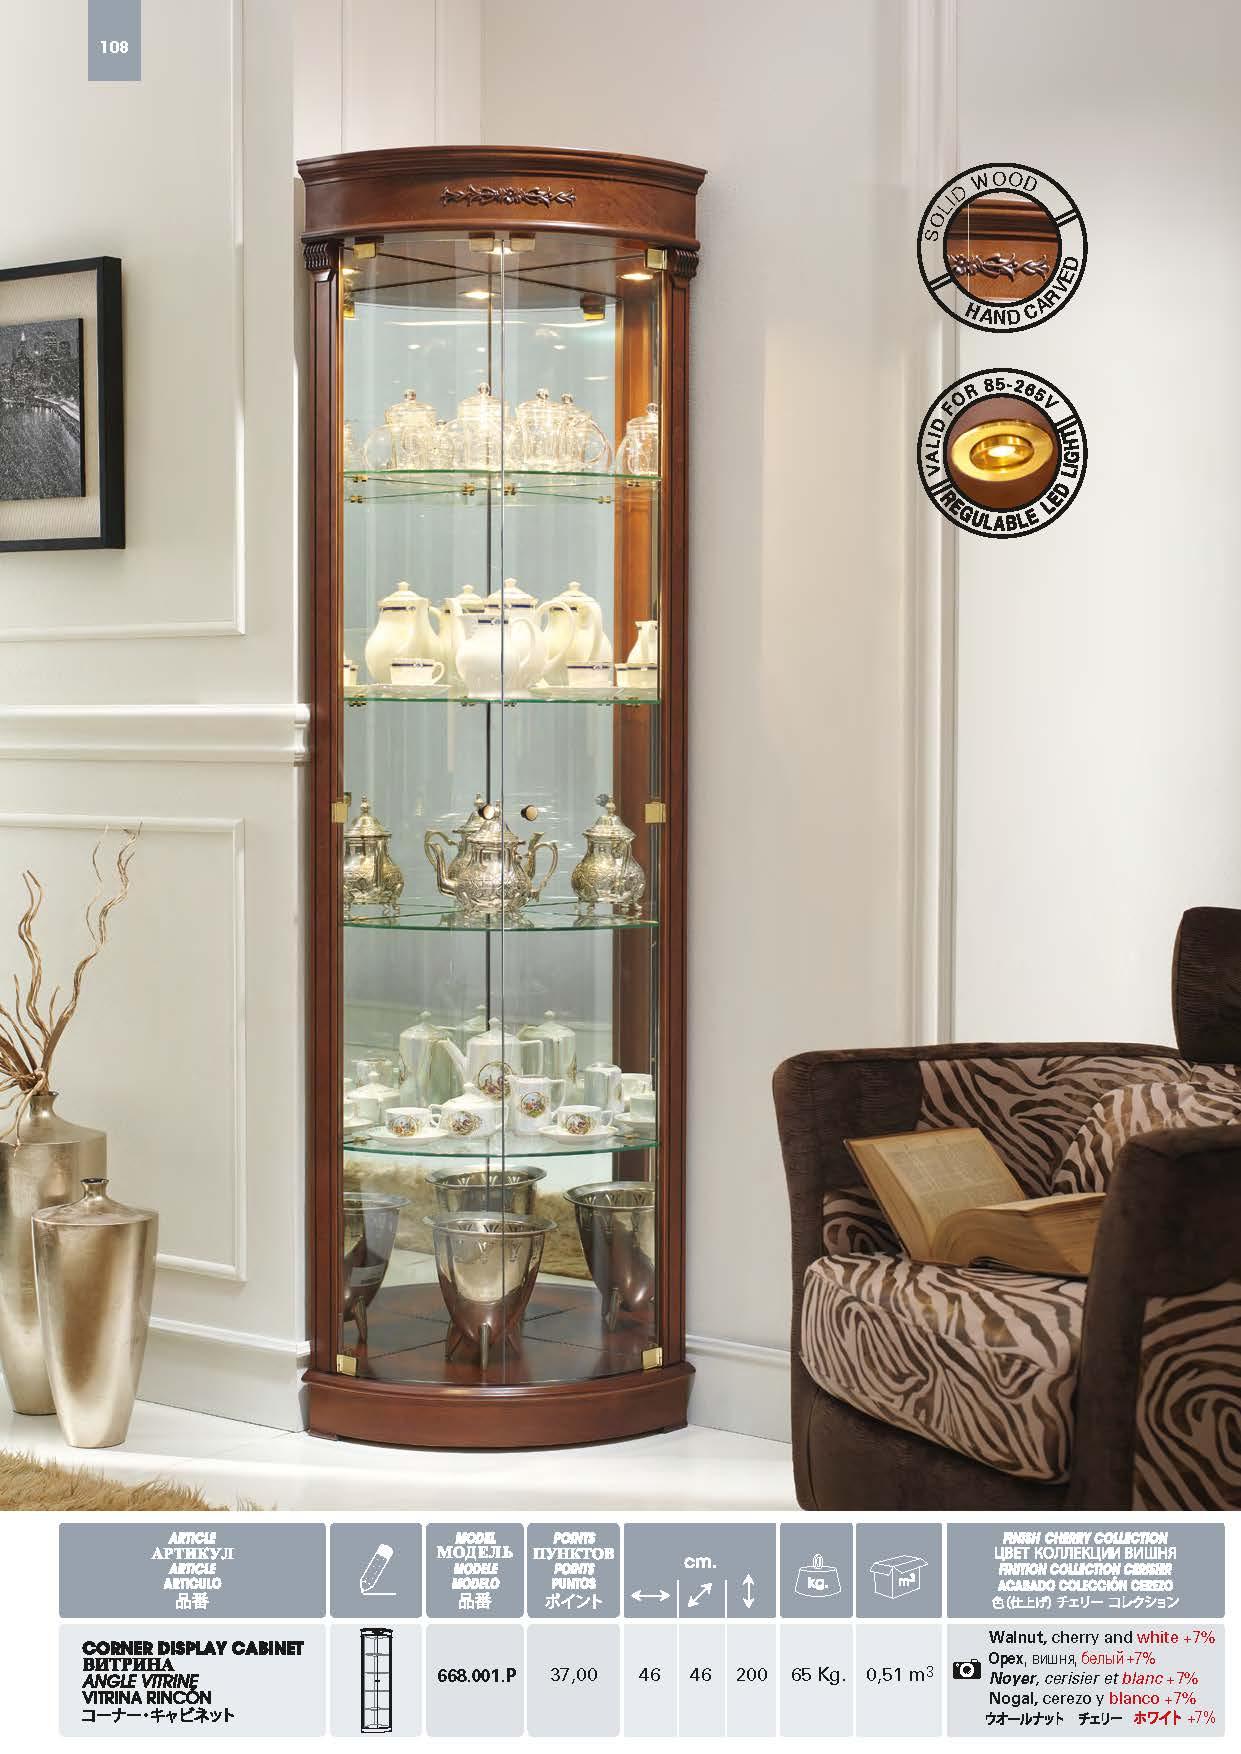 Corner Display Cabinet Model 668001P